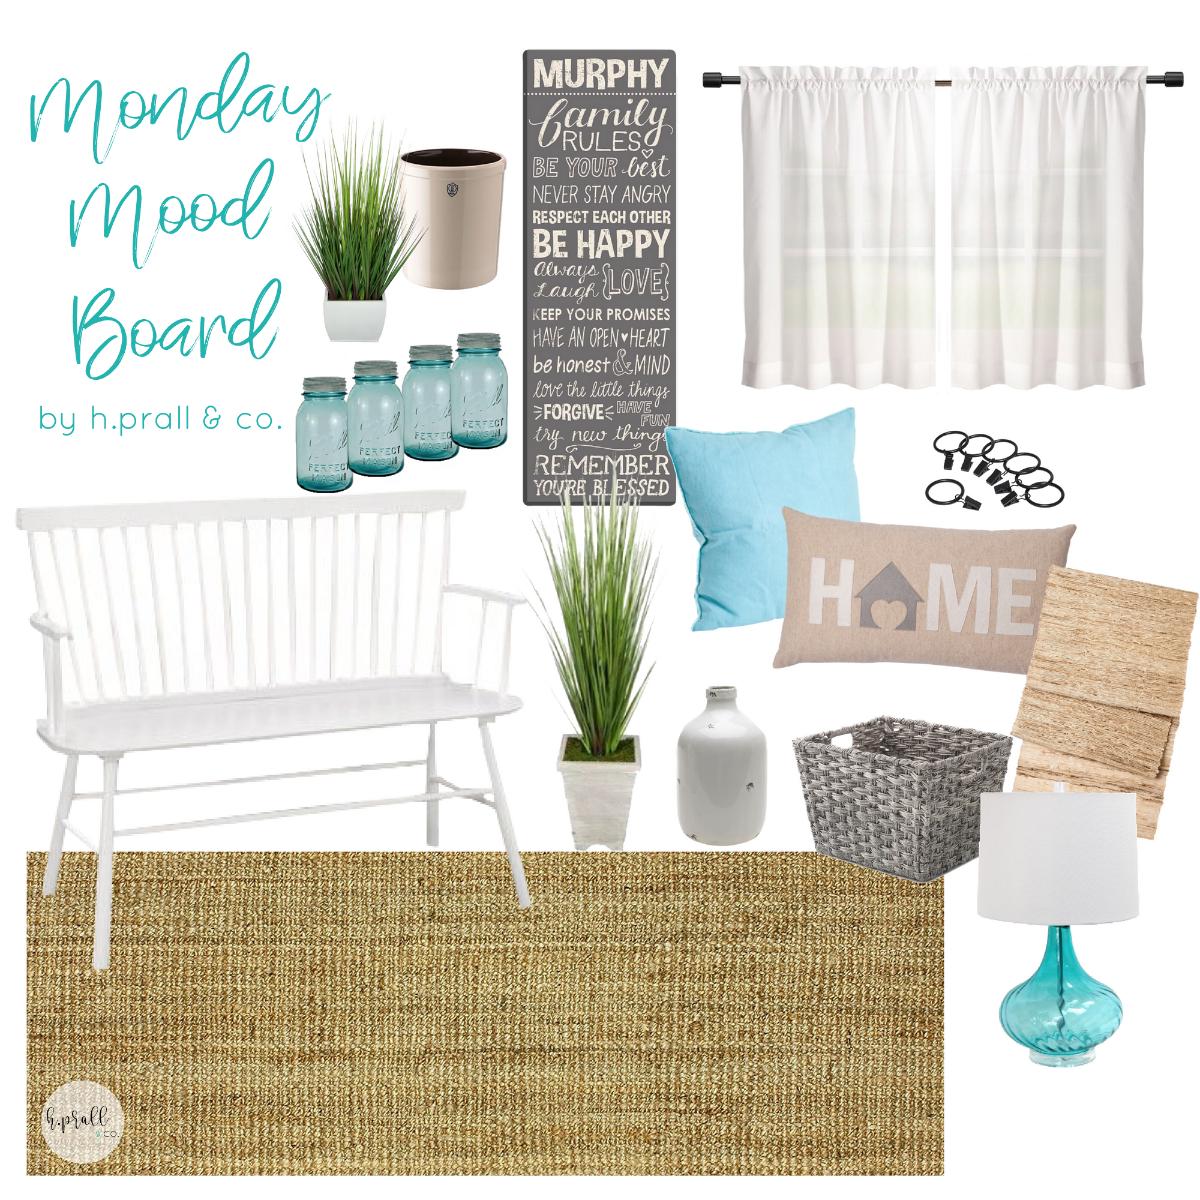 Monday Mood Board by H.Prall & Co. Interior Decorating | hprallandco.com